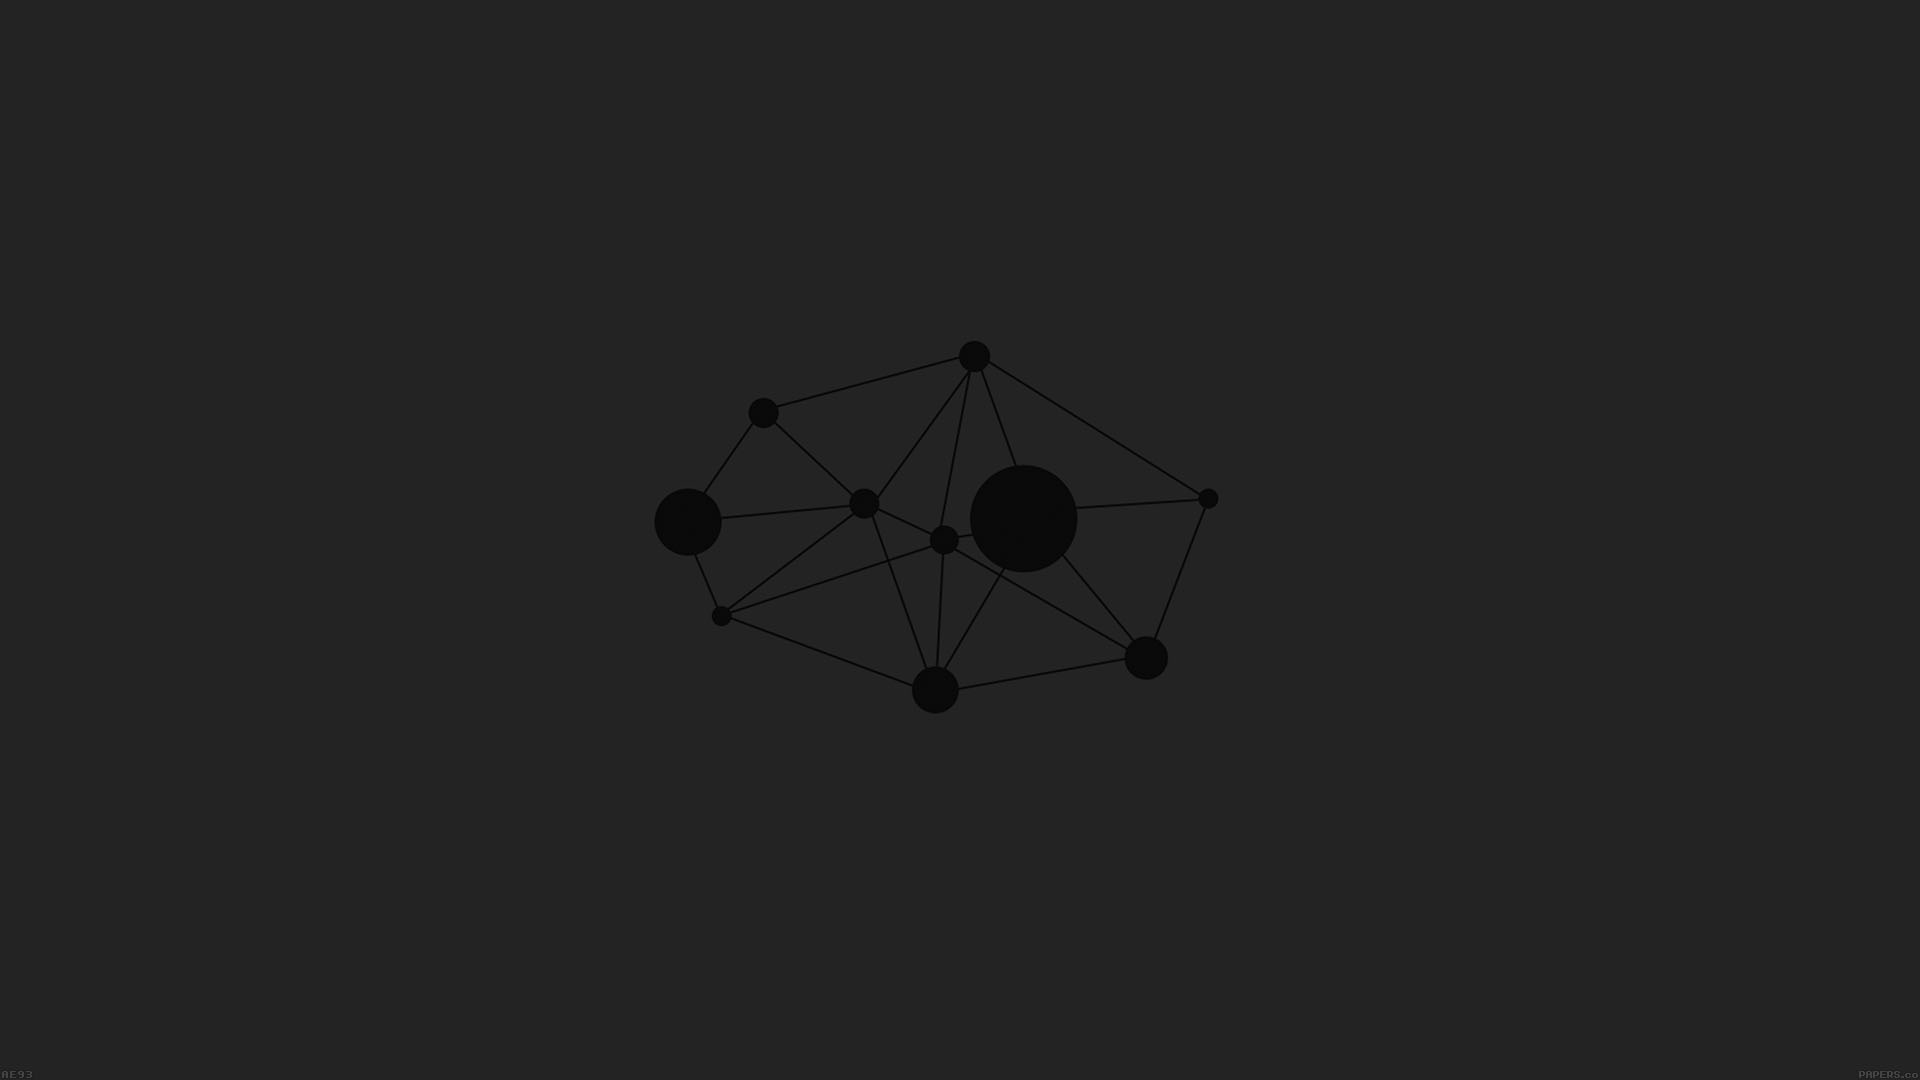 Ae93 polygons minimal geometric art for Minimal art essay